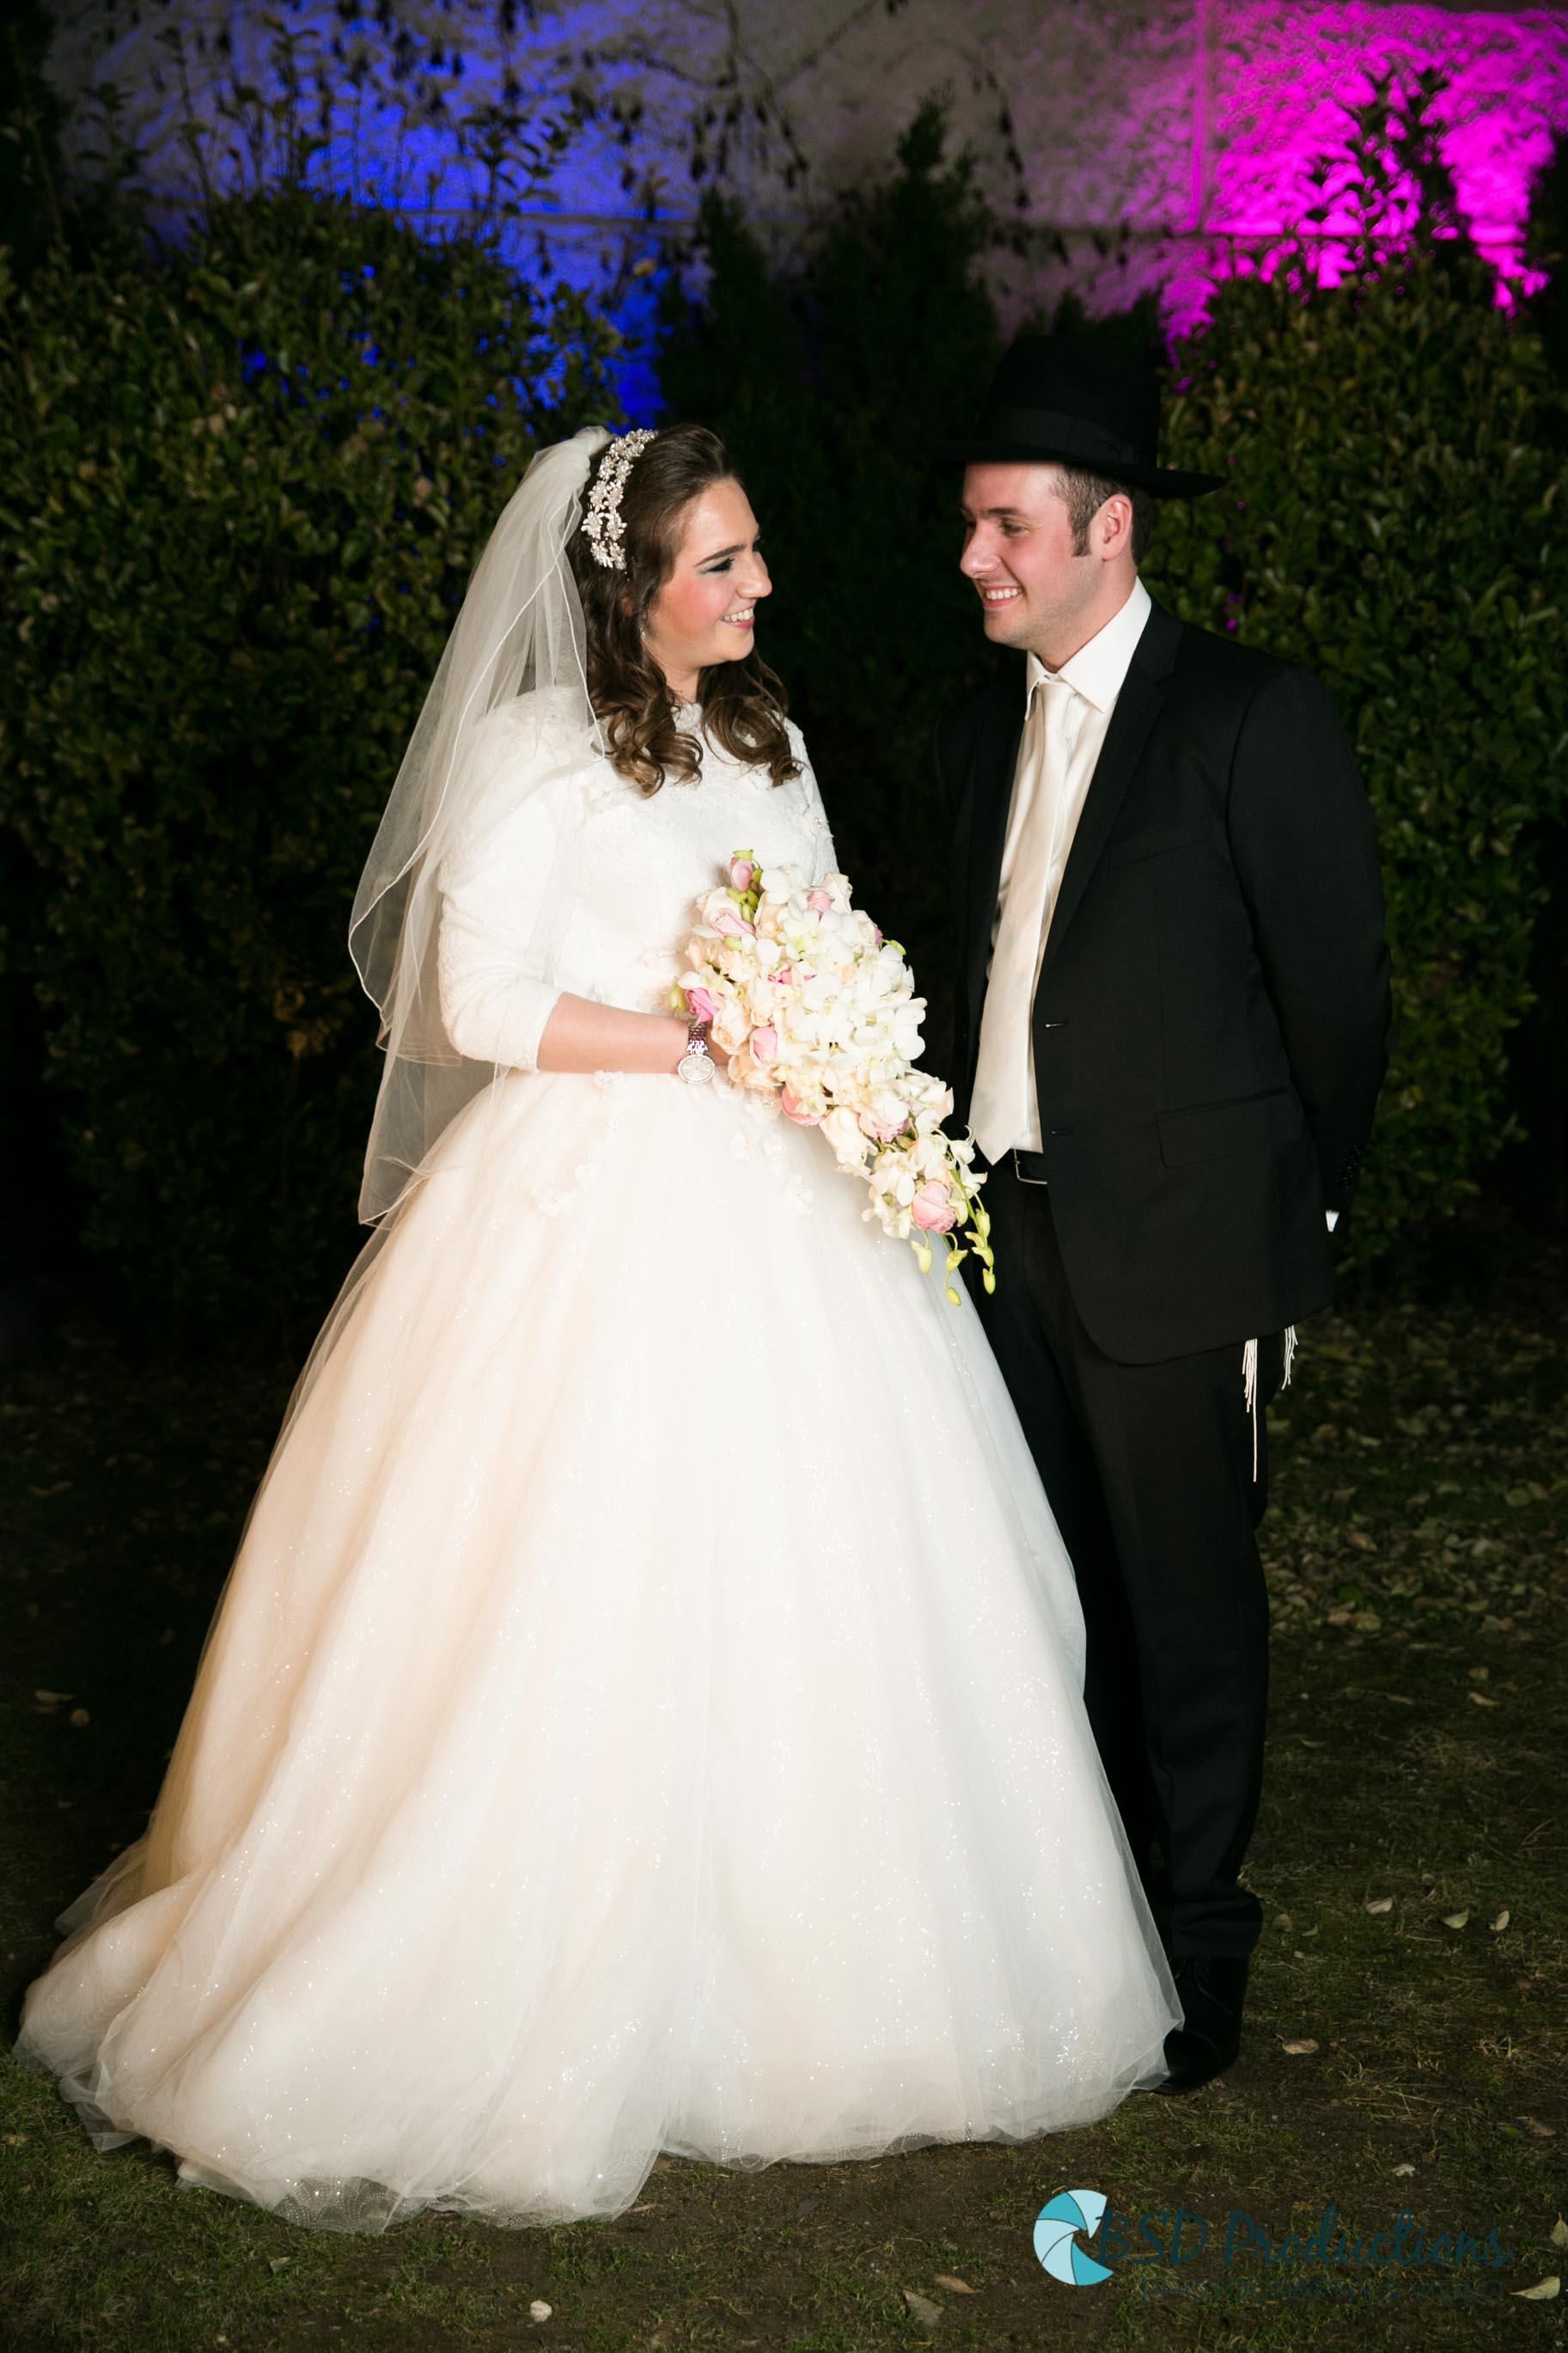 UH5A9324 Wedding – BSD Prodcutions Photography